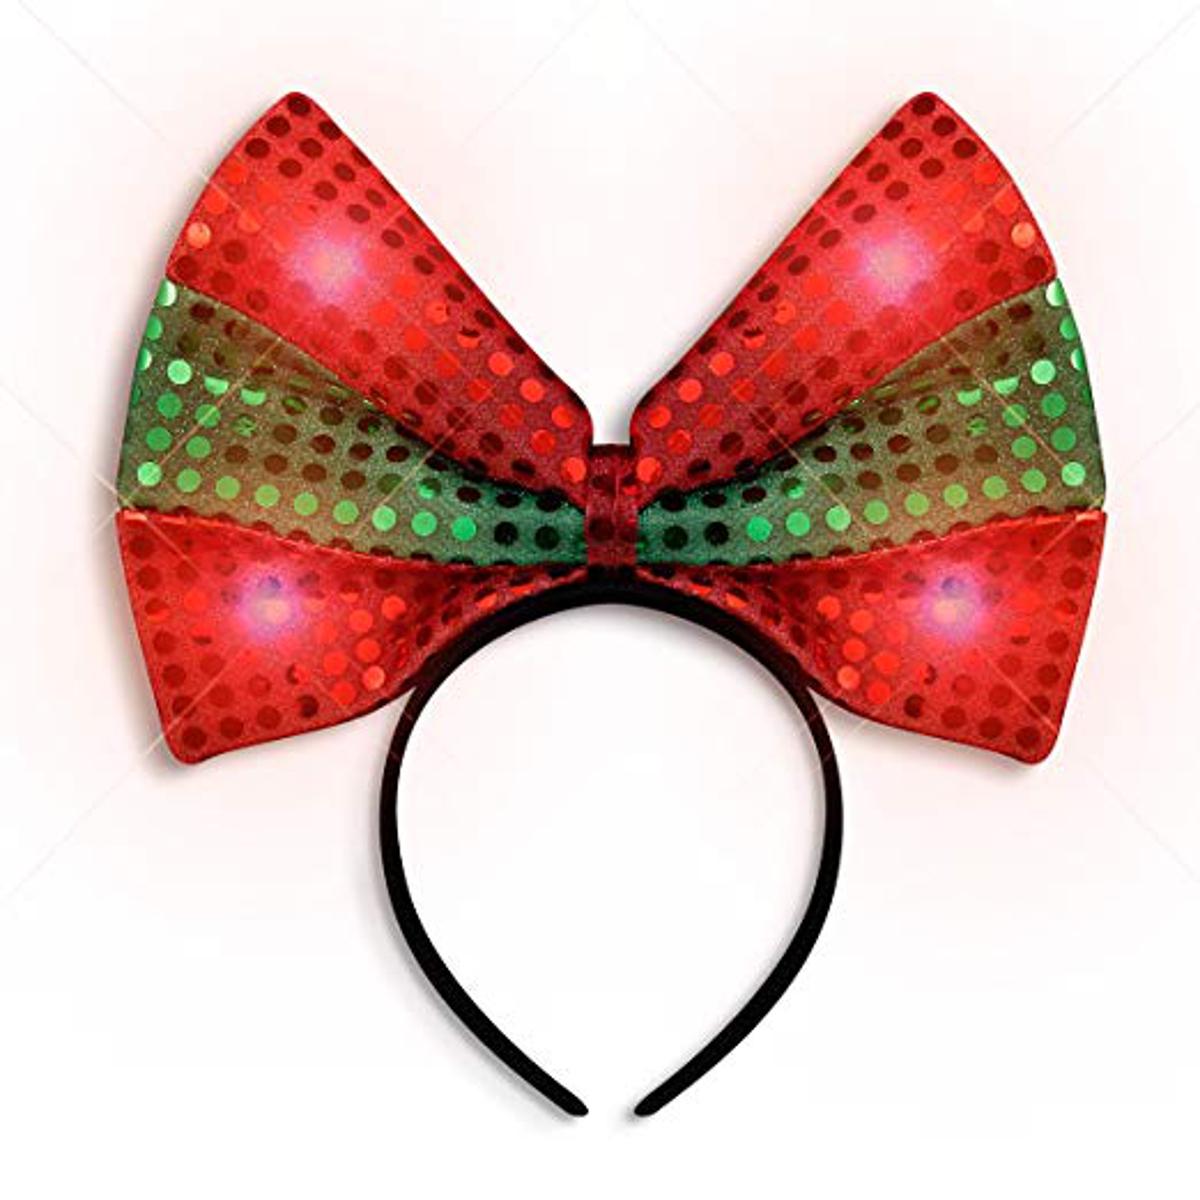 LED Christmas Bow Light Up Headband All Products